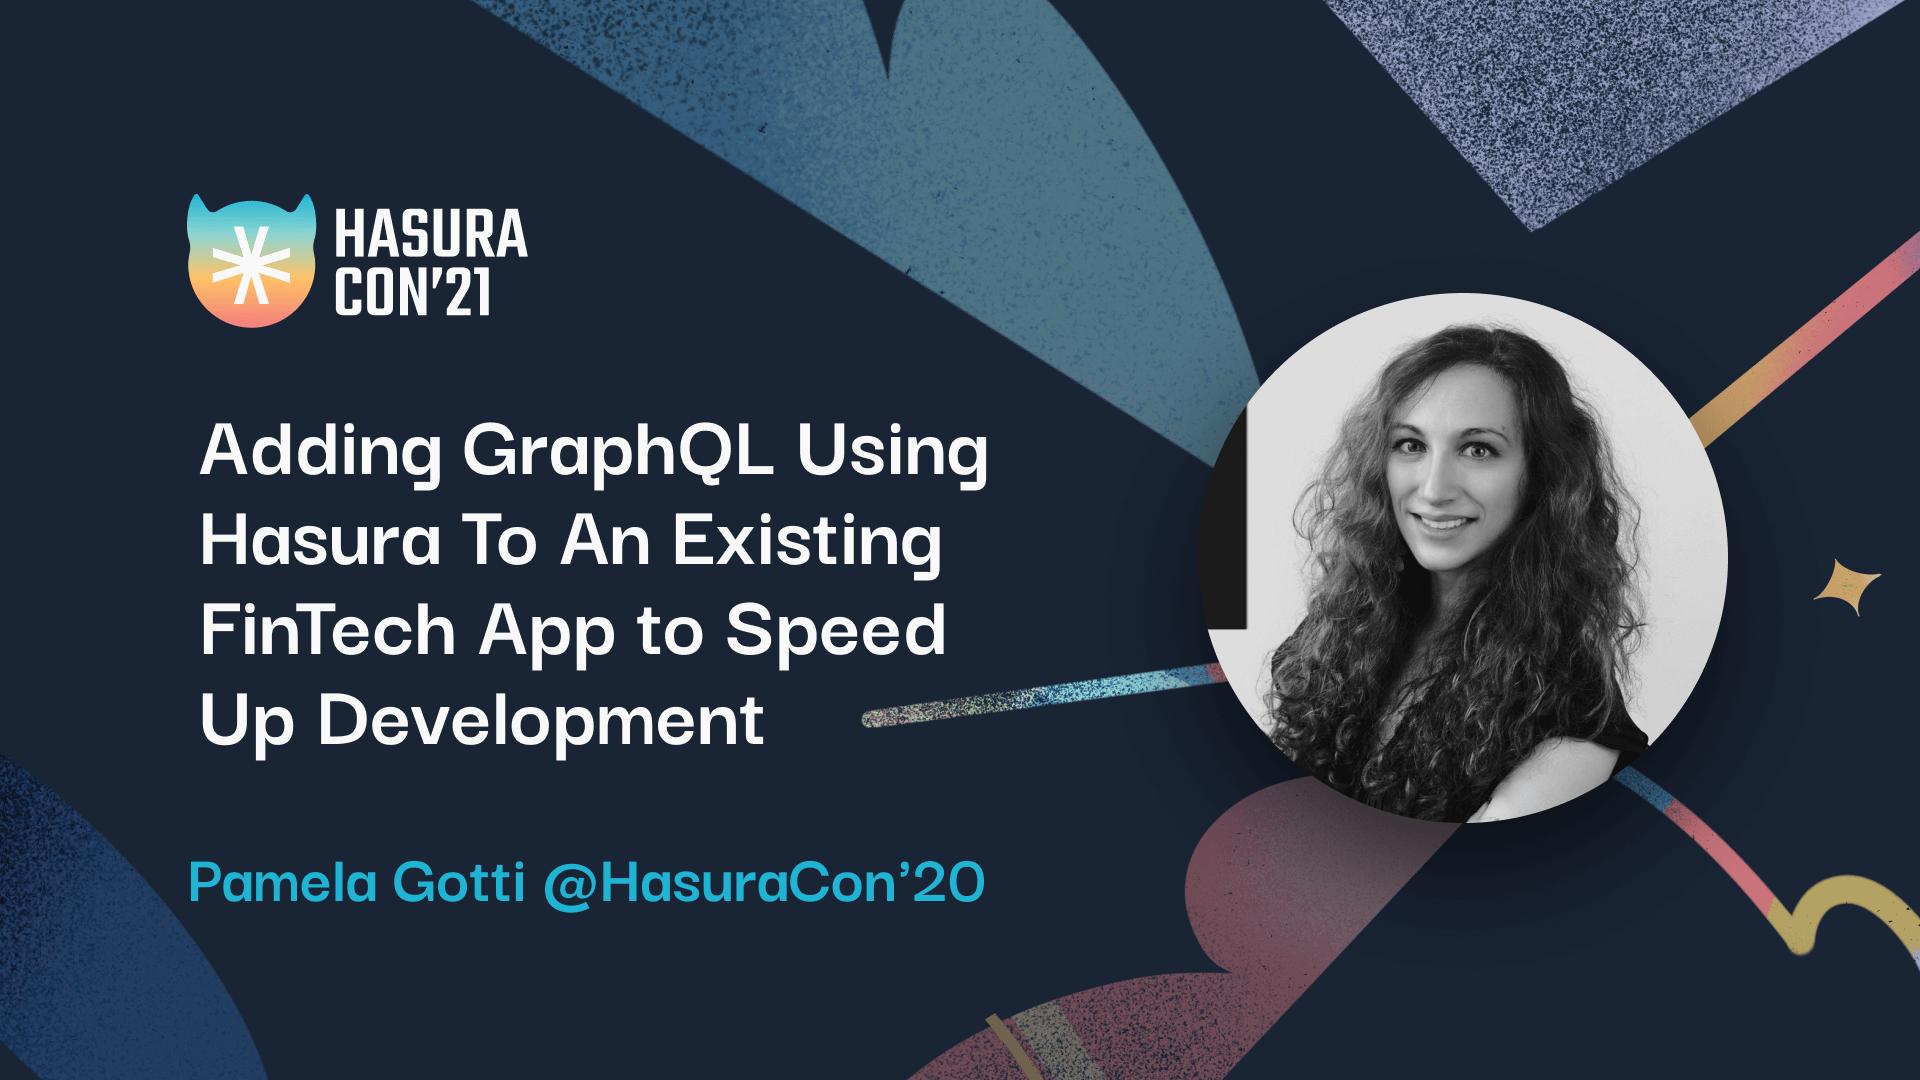 Adding GraphQL Using Hasura To An Existing FinTech App to Speed Up Development by Pamela Gotti of Credimi @HasuraCon'20